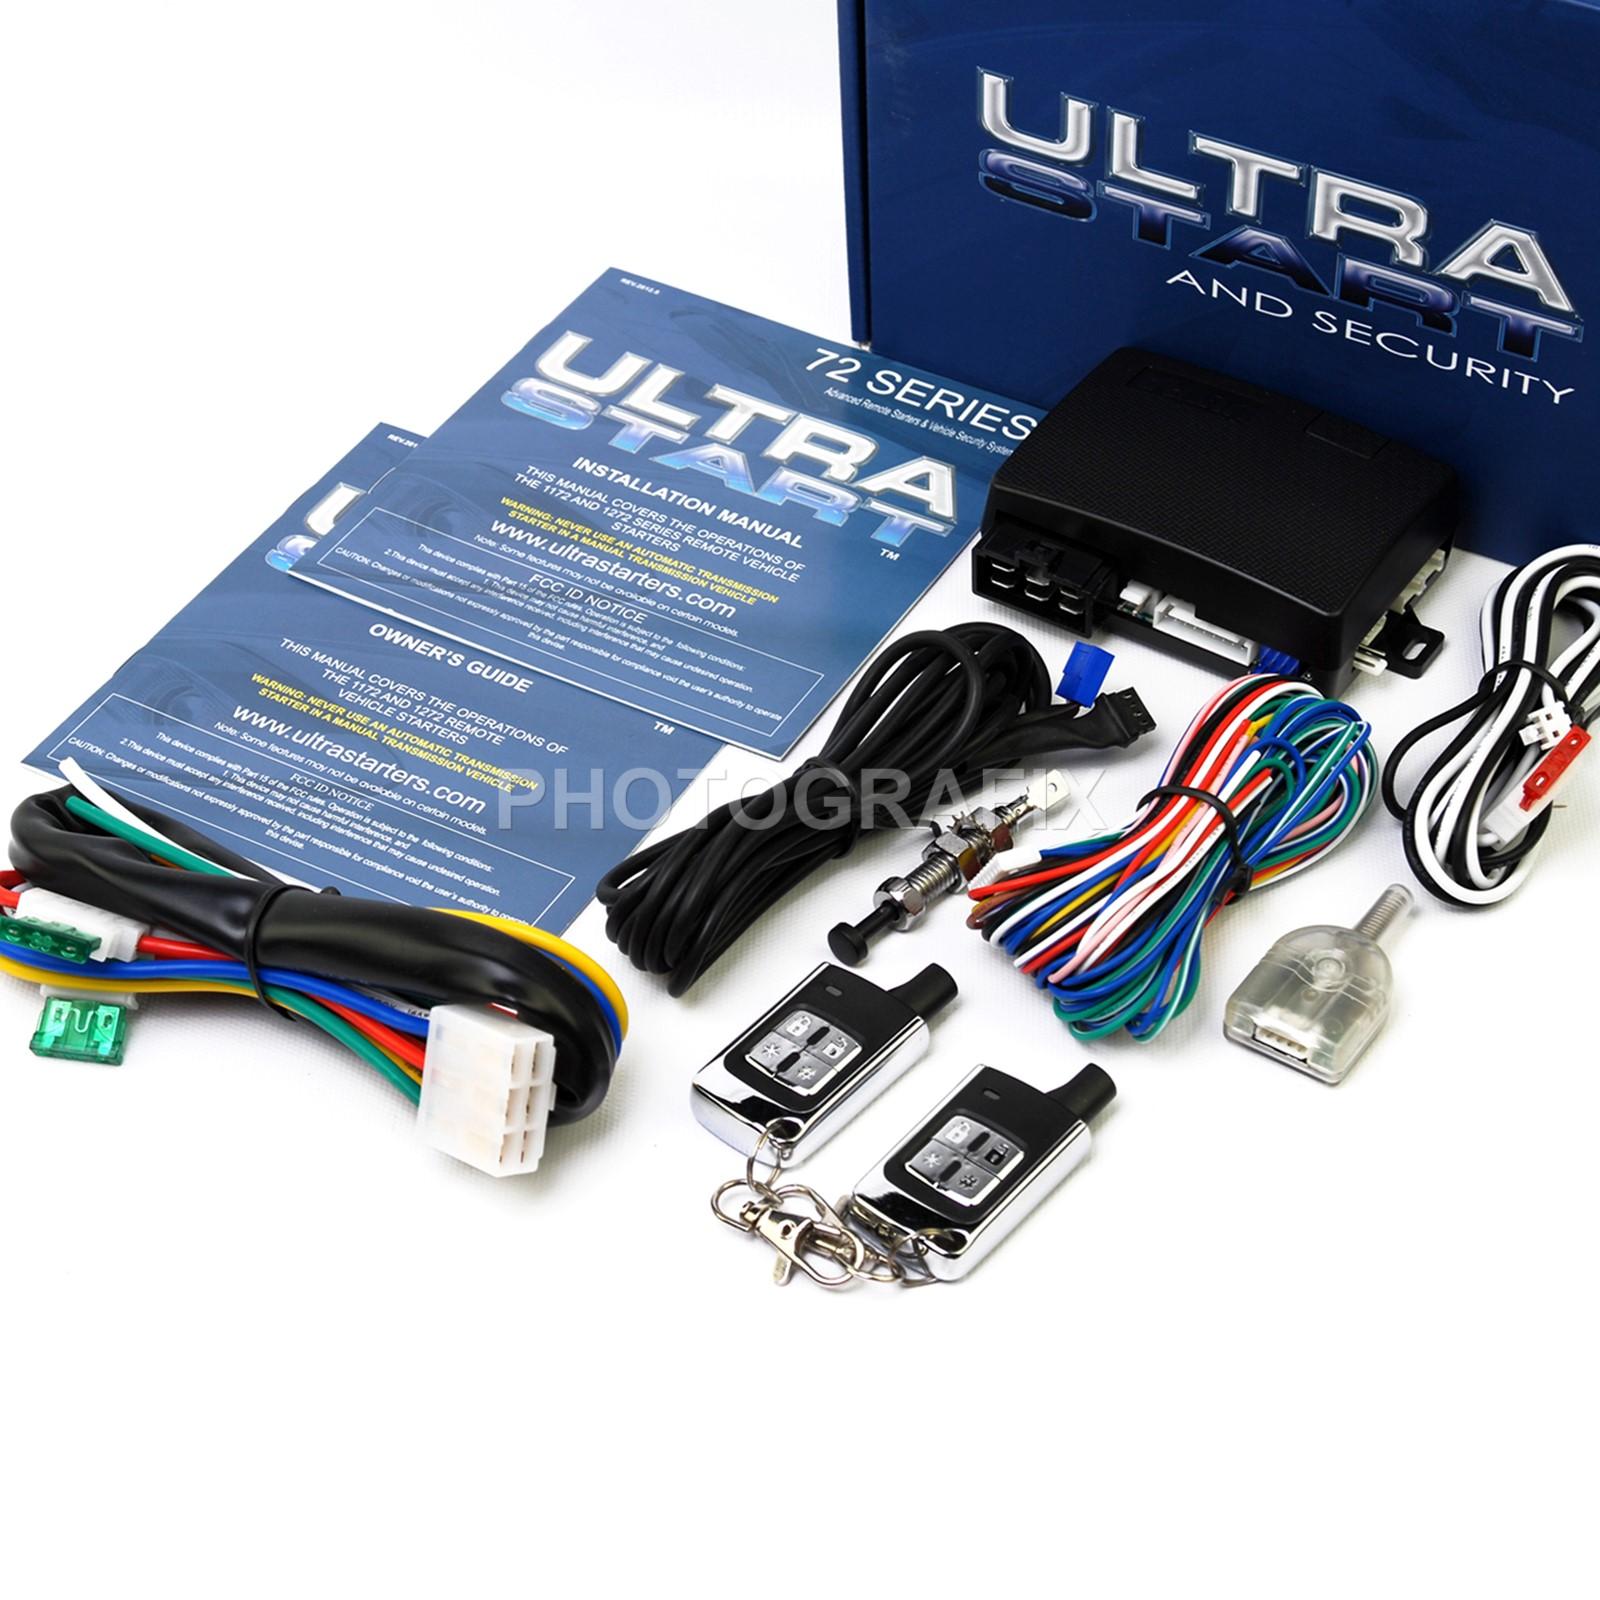 Remote Start Wiring Ultra Real Diagram Vehicle Diagrams 1272 Xr Pro Keyless Auto Car Starter Rh Cafr Ebay Ca Dei Python Installation Guide